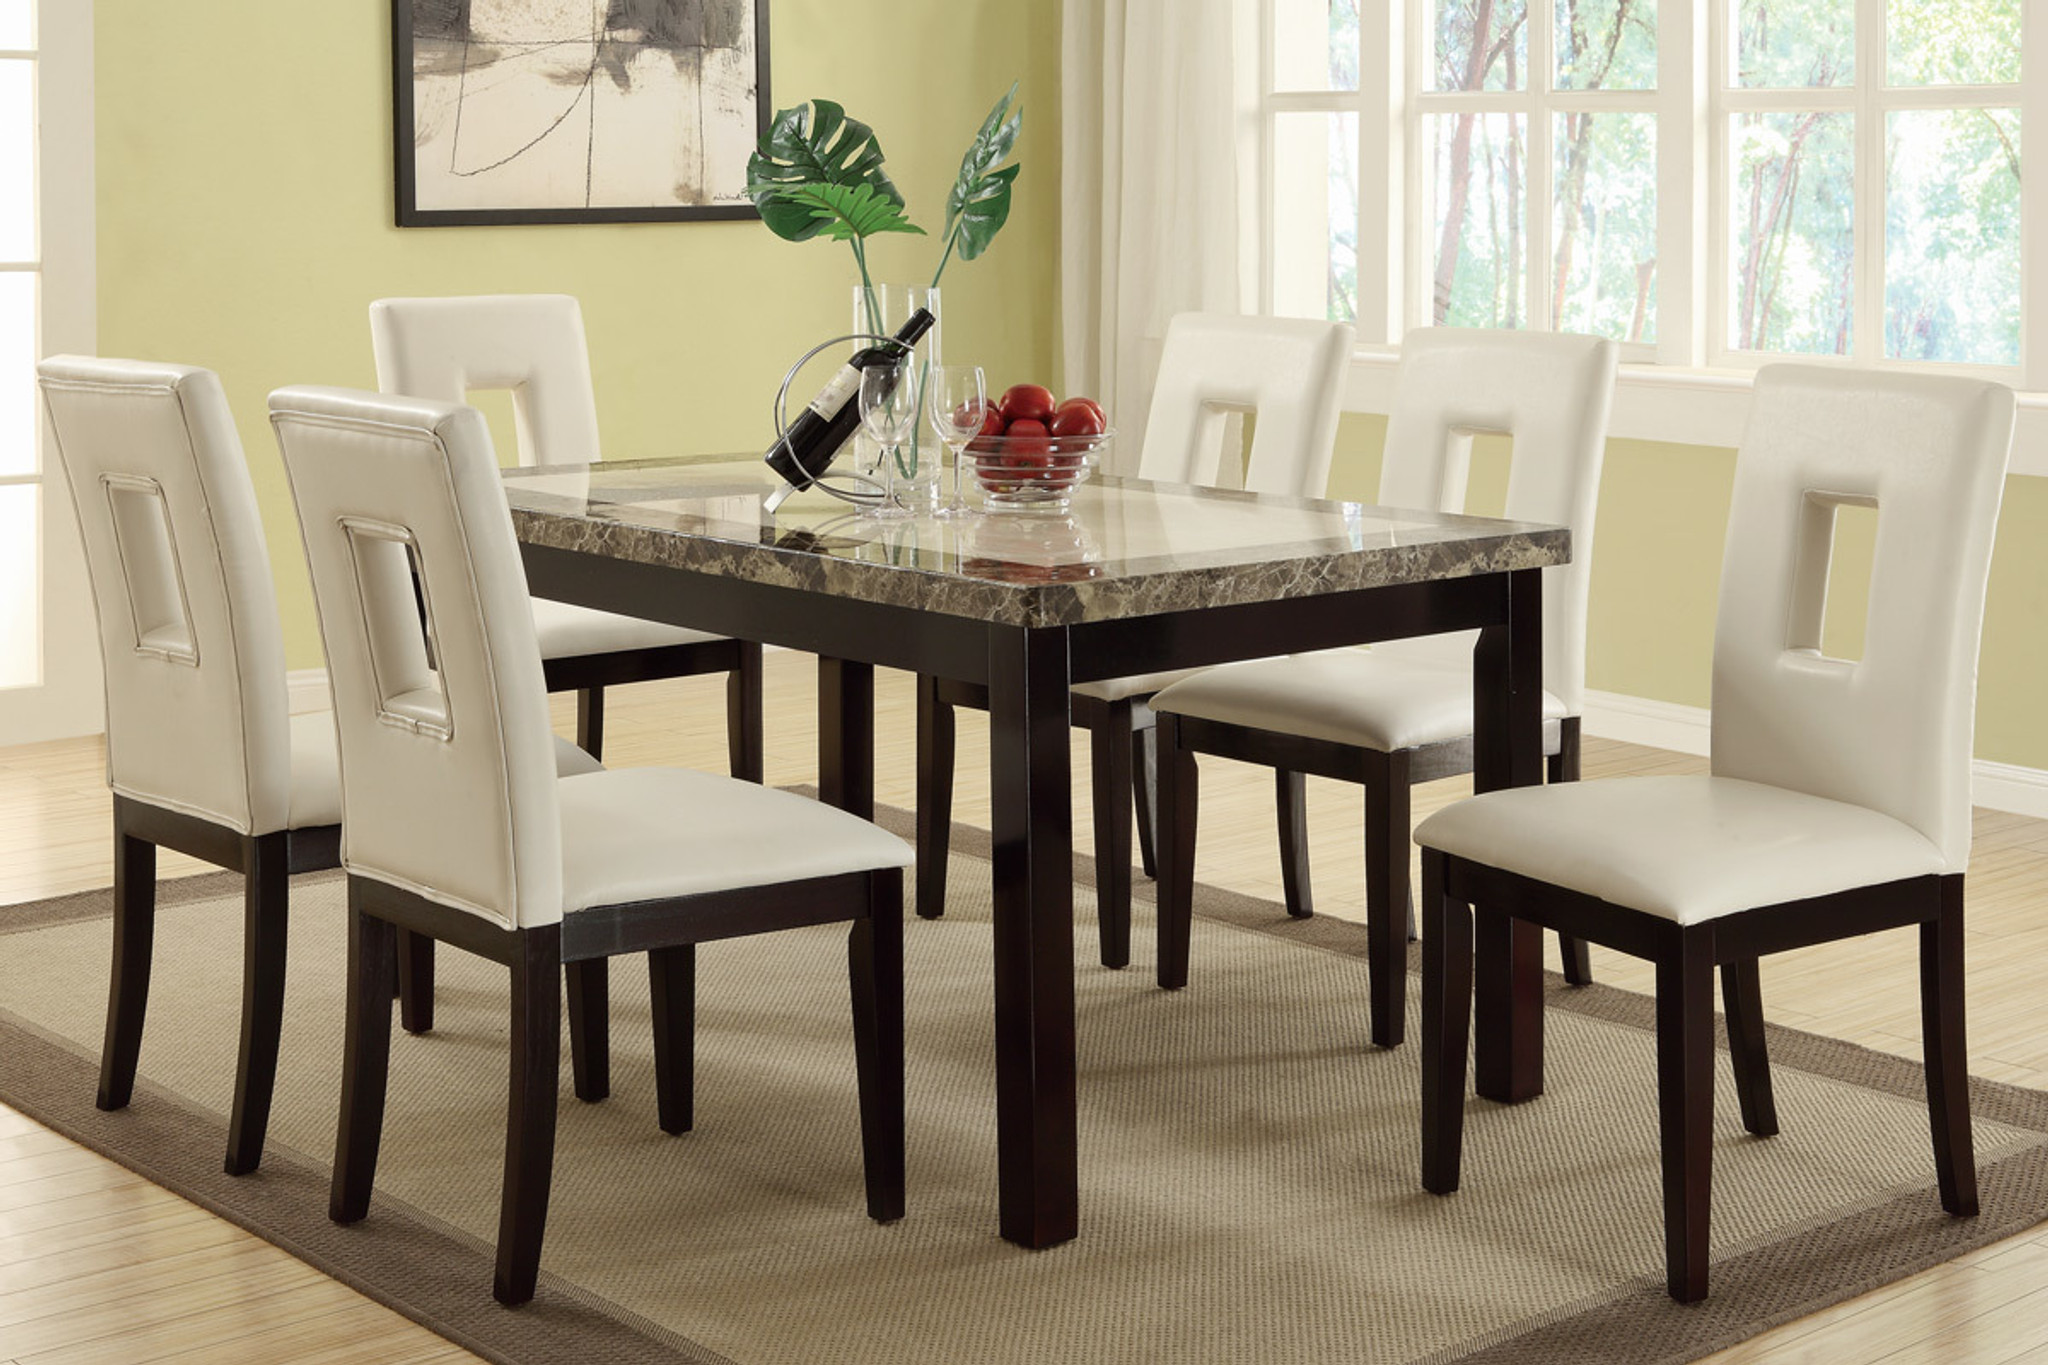 Kassa Mall Home Furniture F2153 F1589 7pcs White Square Shaped Eyelets High Back Dining Room Set